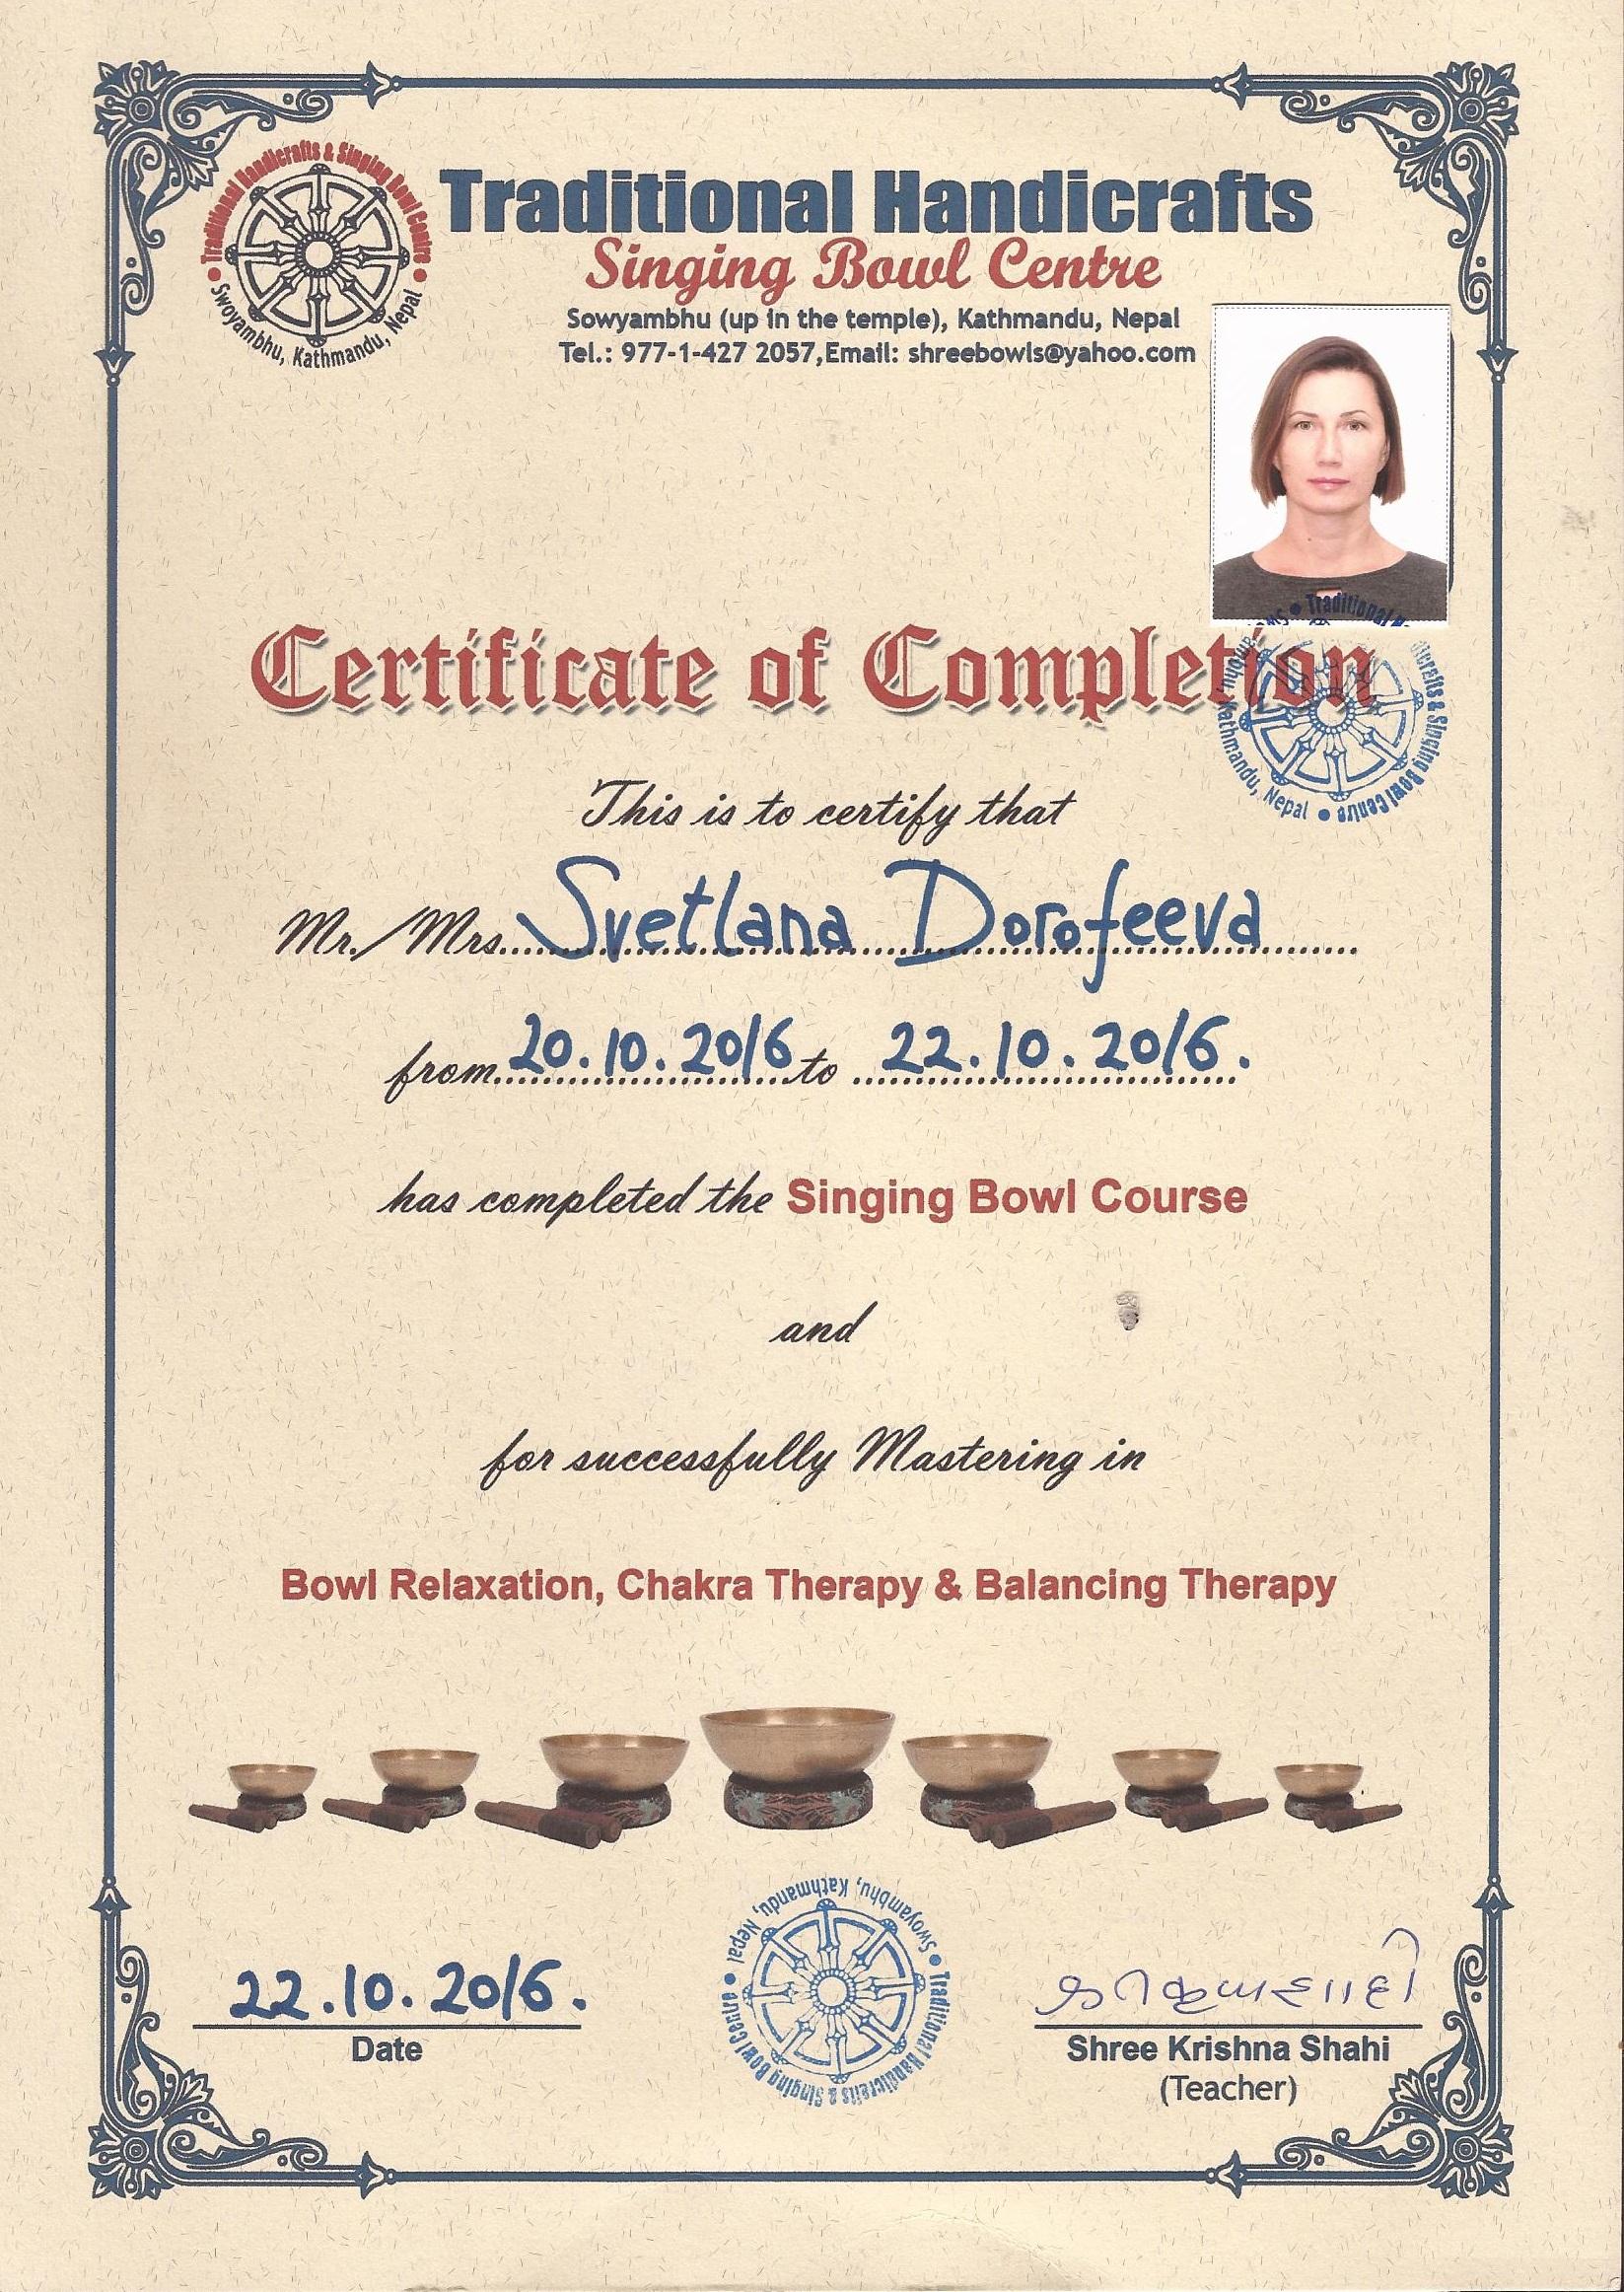 Мастер Терапии, Балансировки и Расслабления Тибетскими чашами, Мастер Шри Кришна Шахи